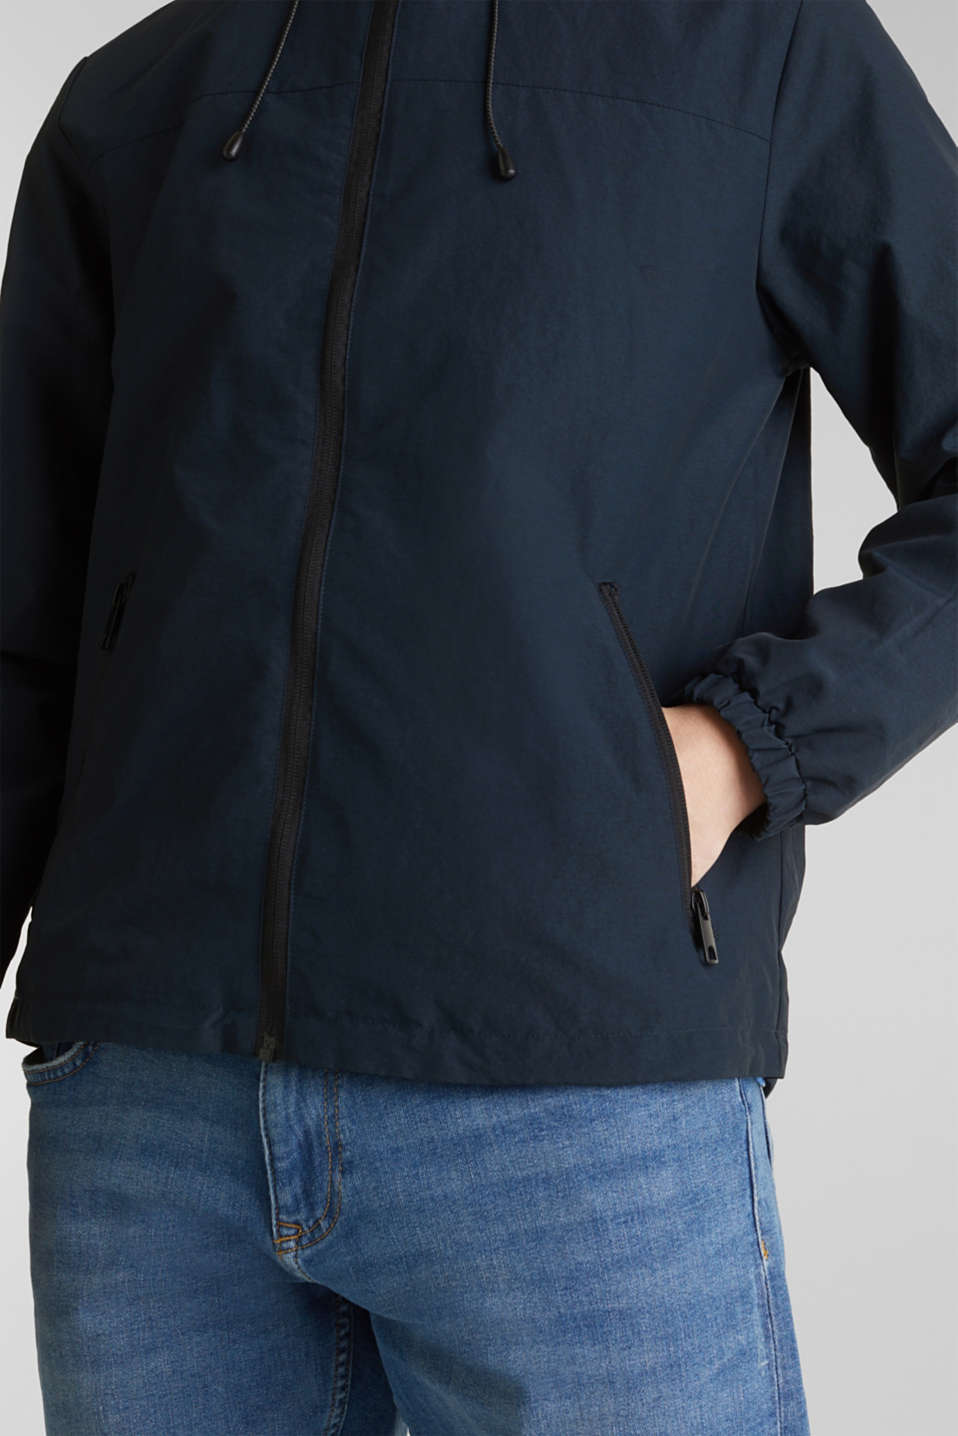 Rain jacket with hood, DARK BLUE, detail image number 2